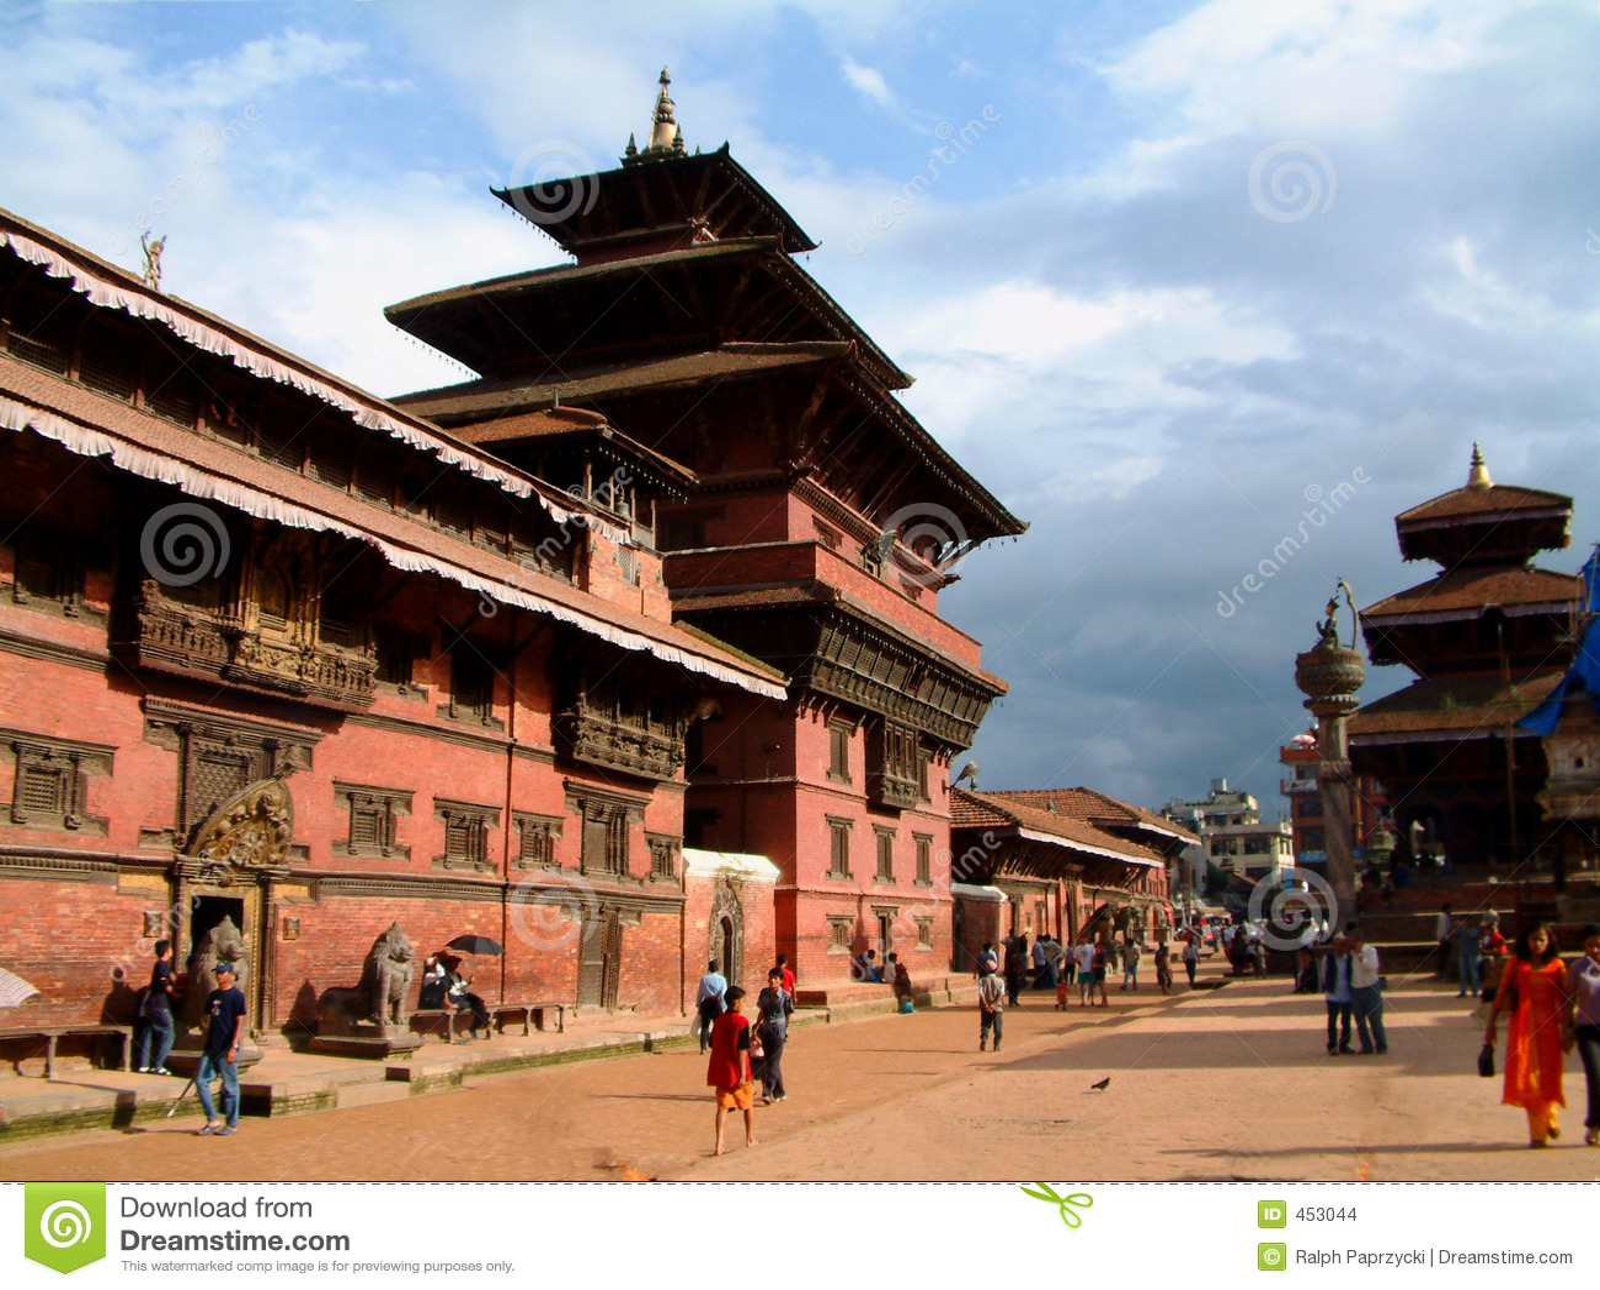 Durbar lalitpur博物馆尼泊尔patan正方形